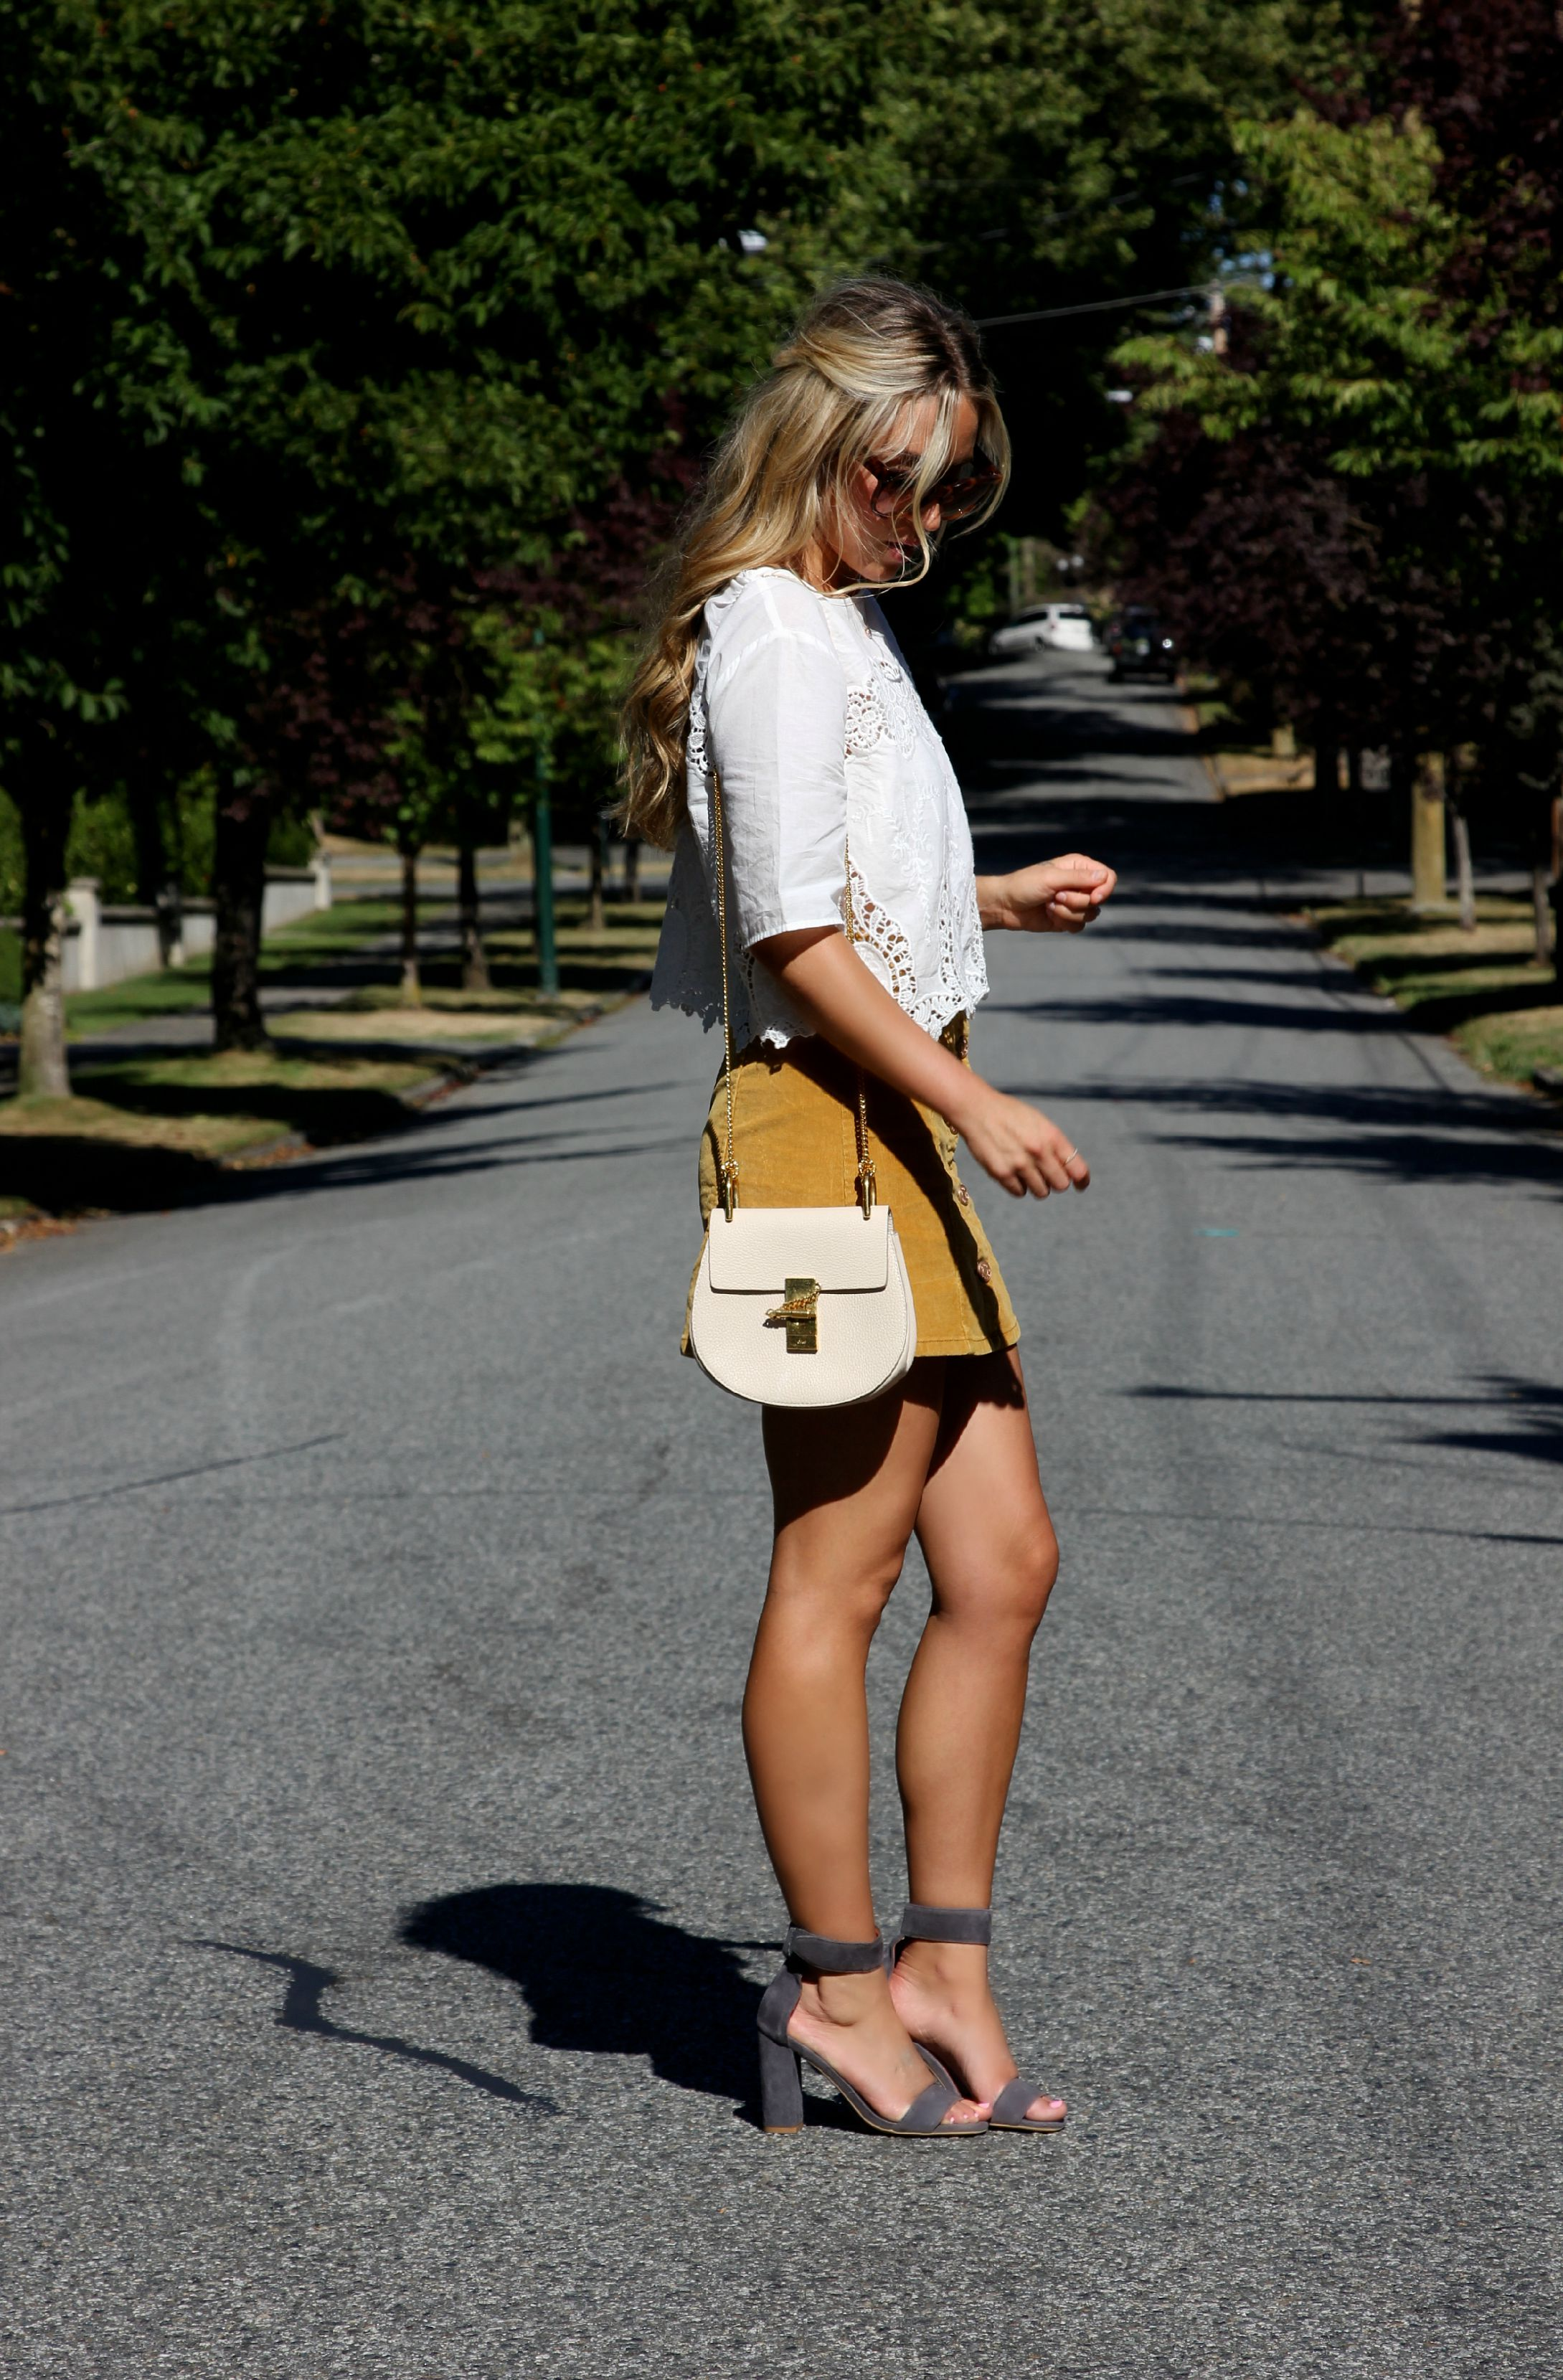 Top ,  Skirt  &  Shoes  via  Urban Outfitters ,  Chloé  Bag,  Céline  Shades,  Effy  Necklace